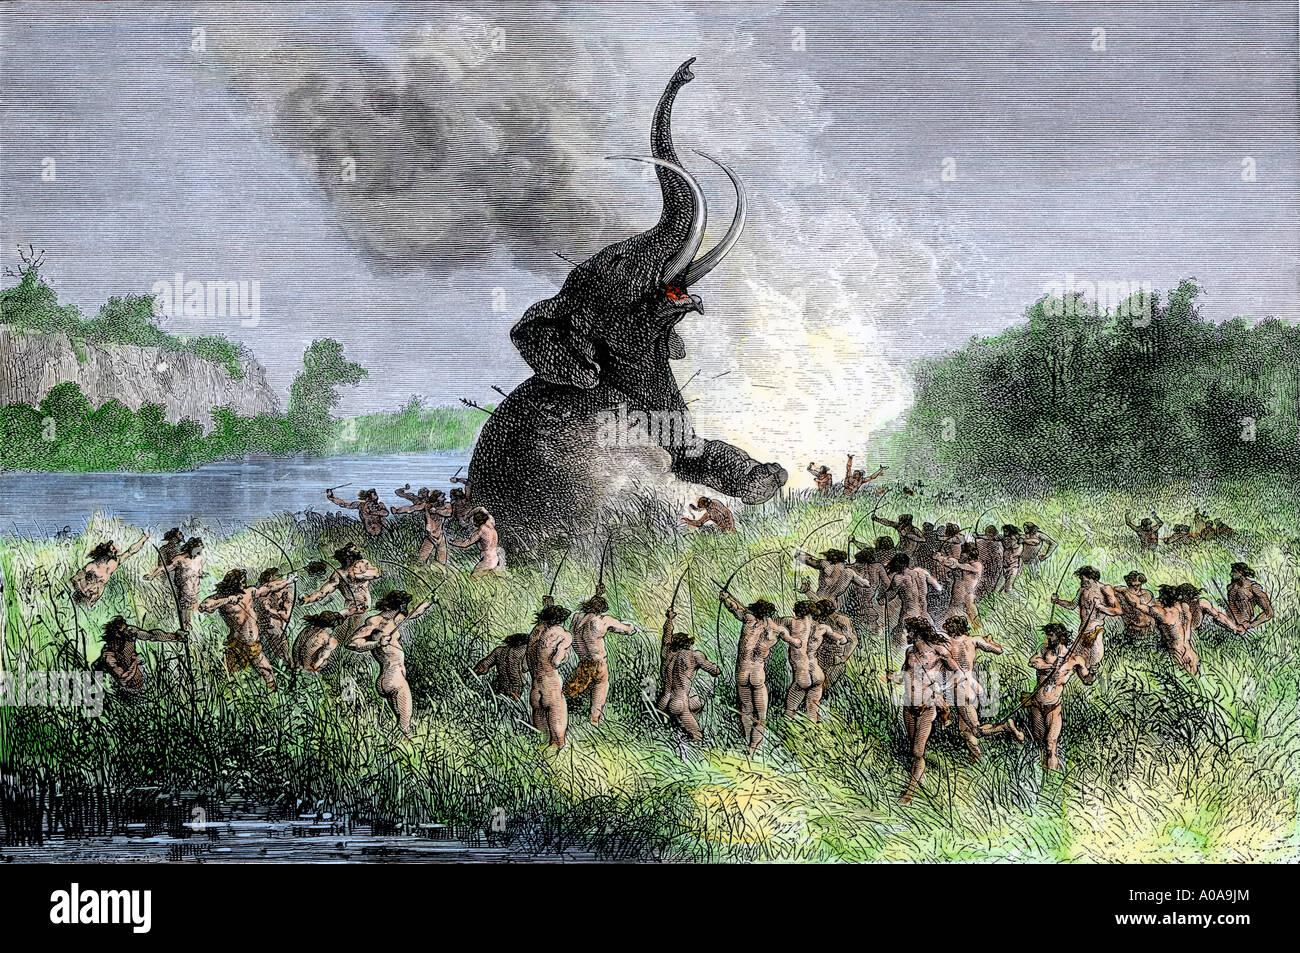 Wooly mammoth cazadores prehistóricos usando arcos y flechas. Xilografía coloreada a mano Imagen De Stock